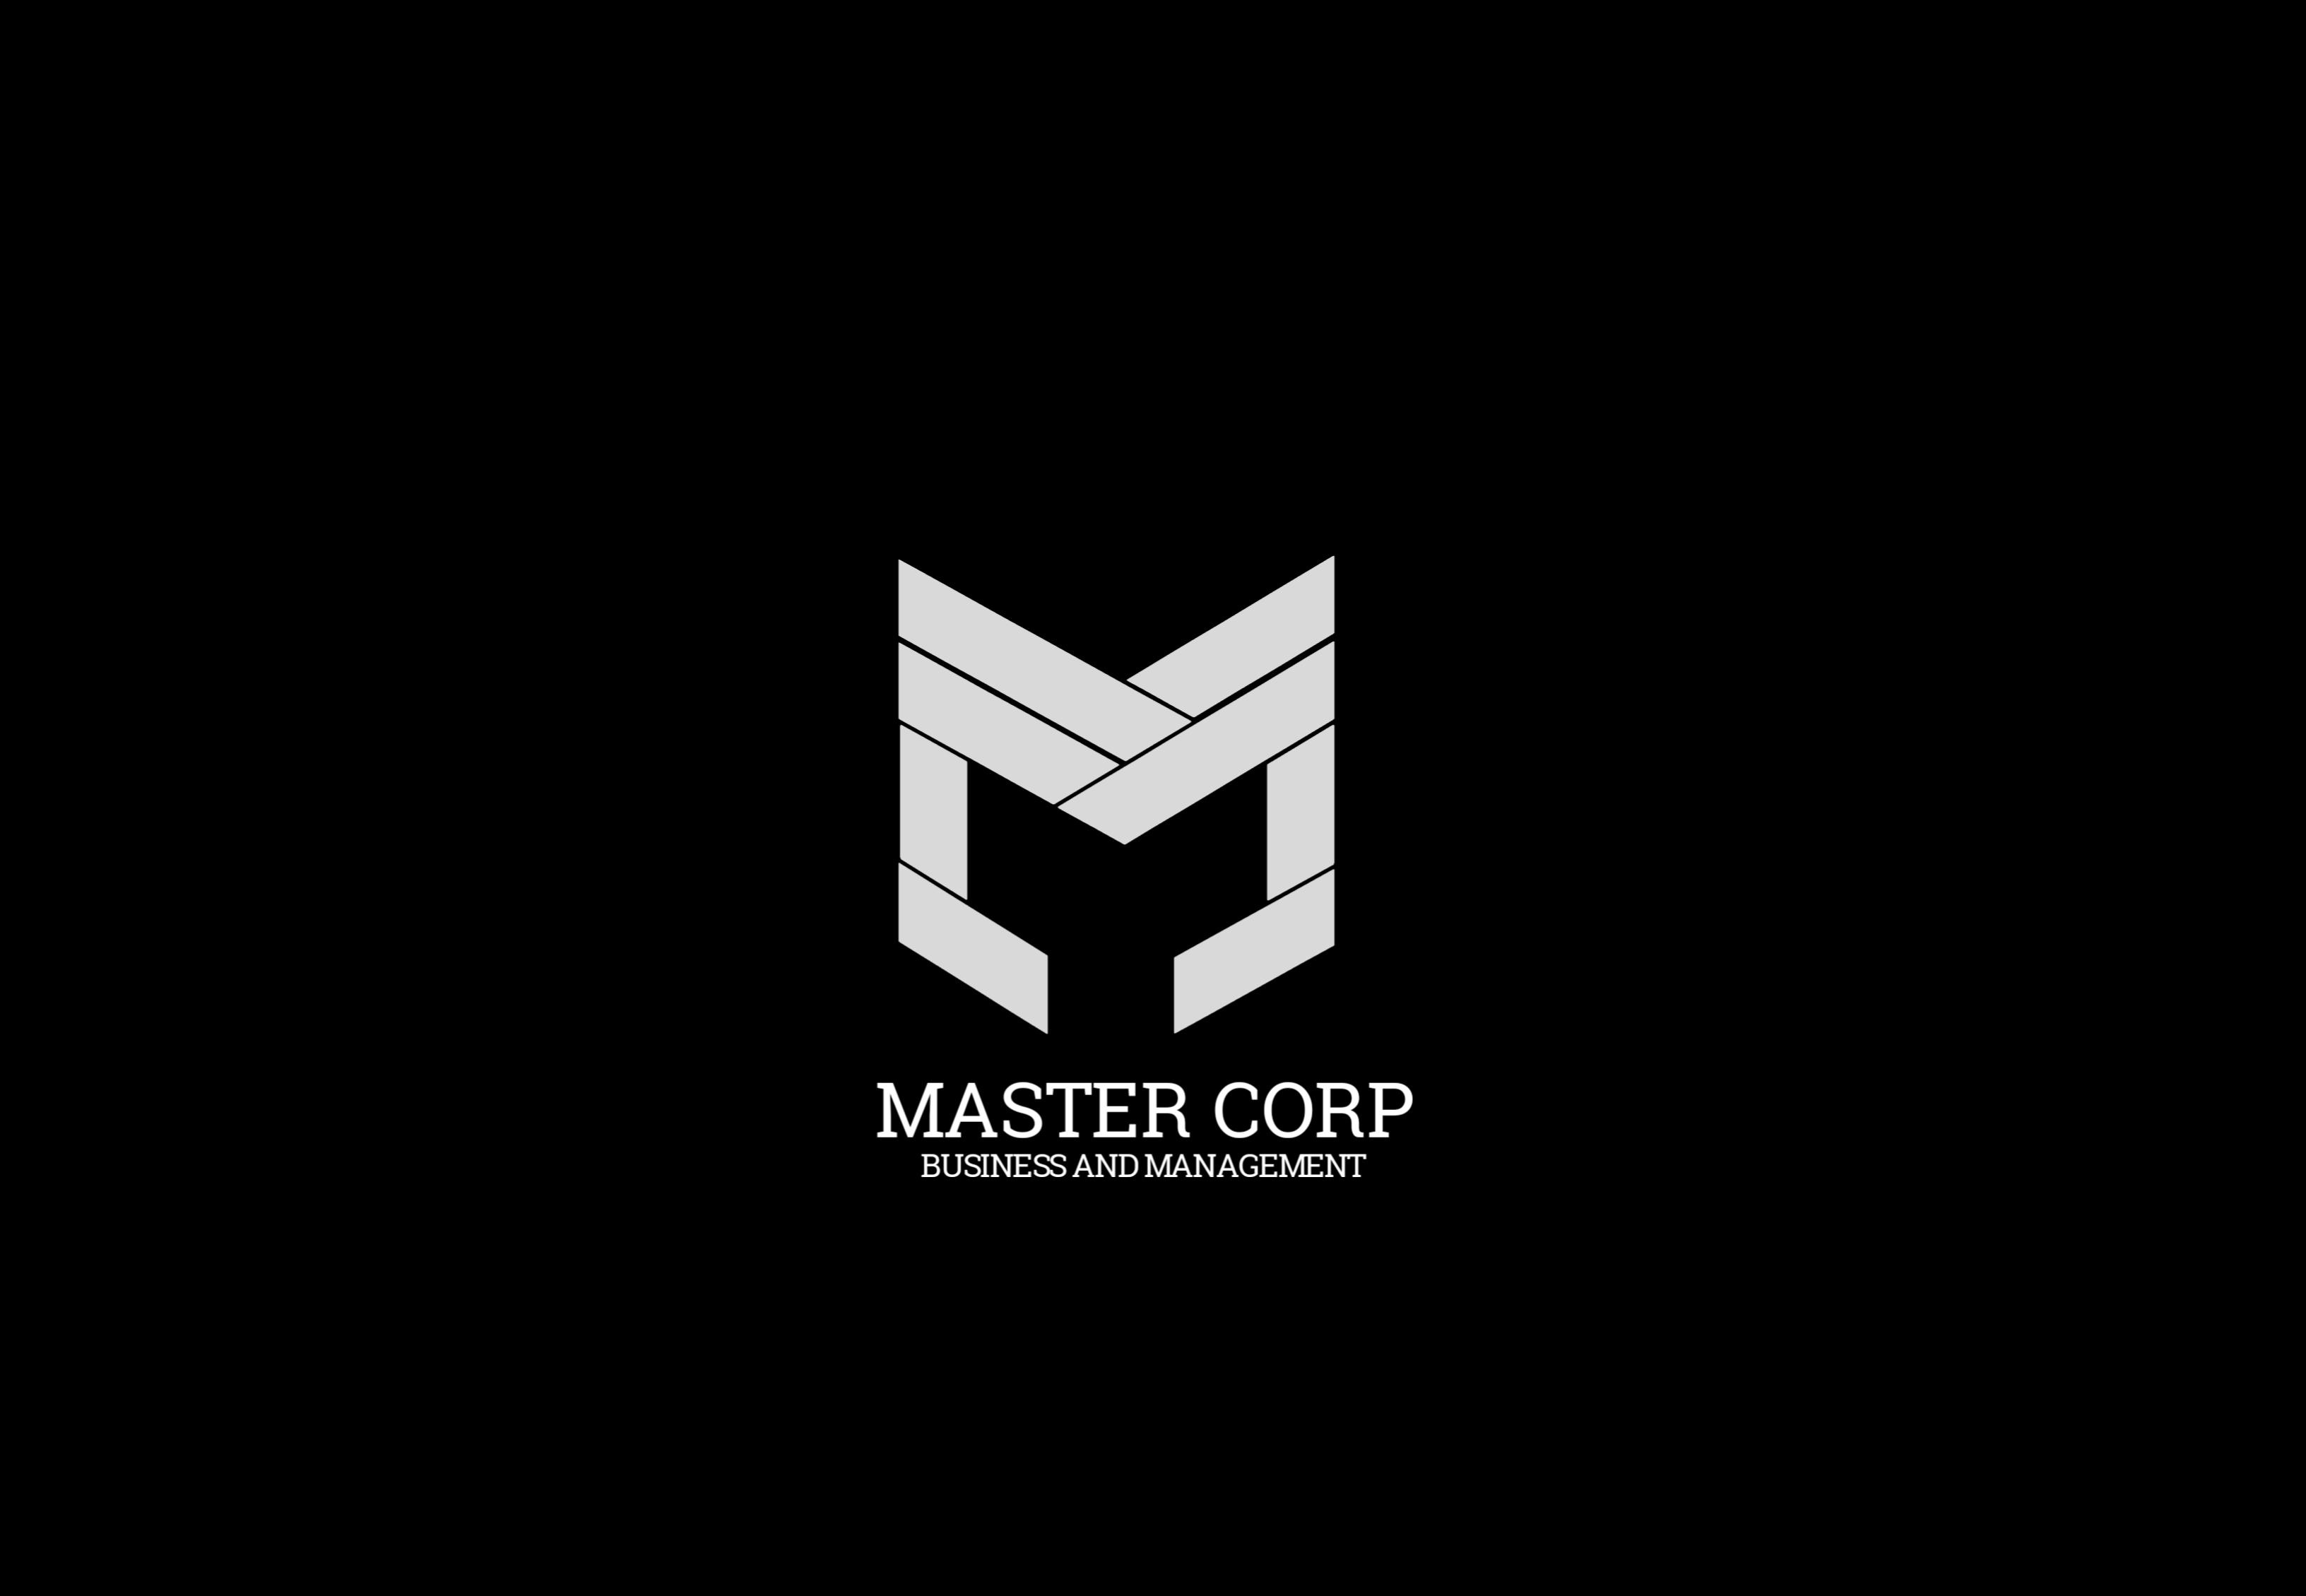 I will create logo design modern professional